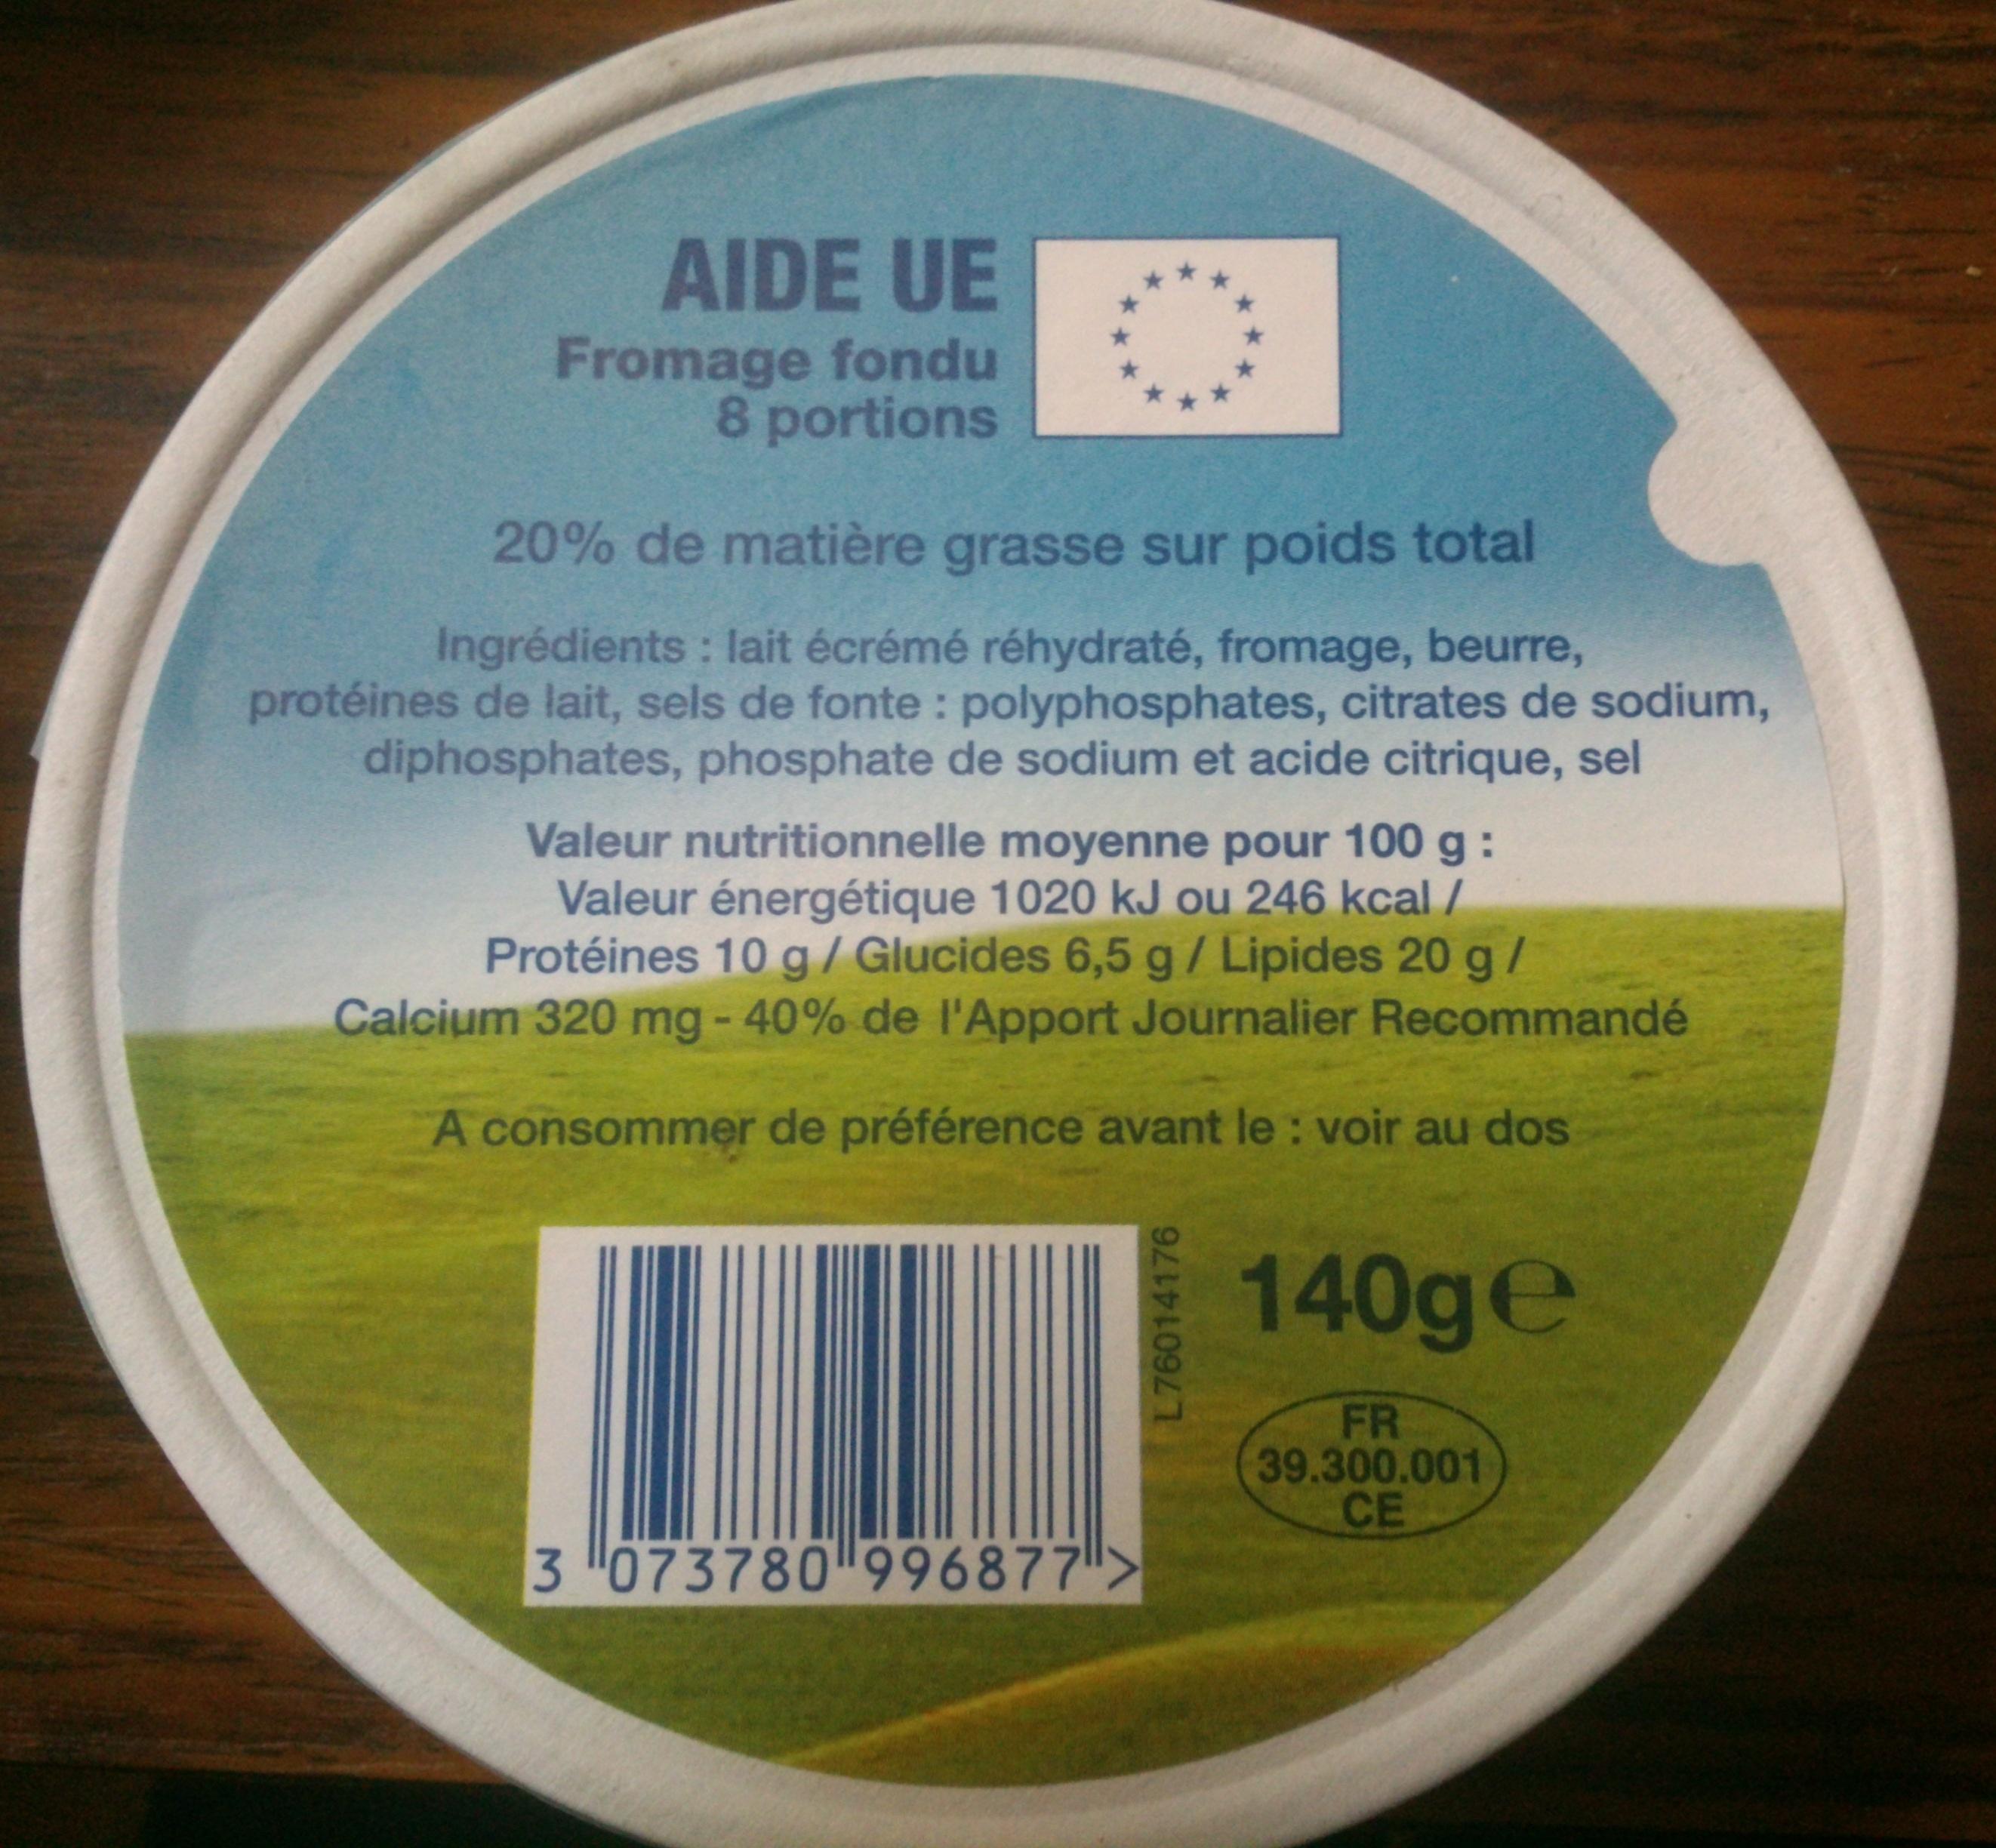 Fromage fondu 8 portions (20 % MG) - Produit - fr